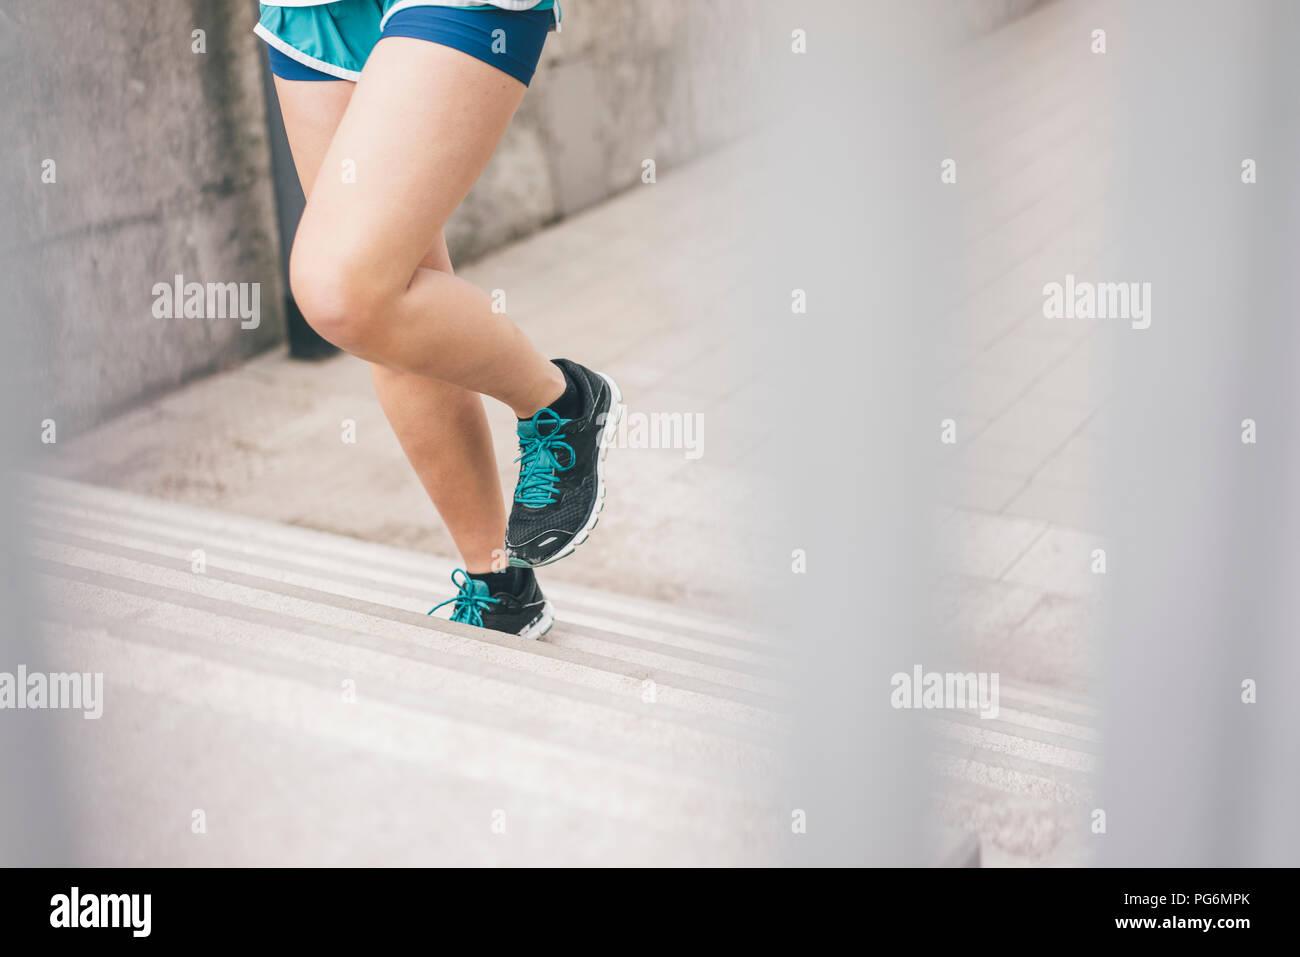 Close-up of woman running à l'étage Photo Stock